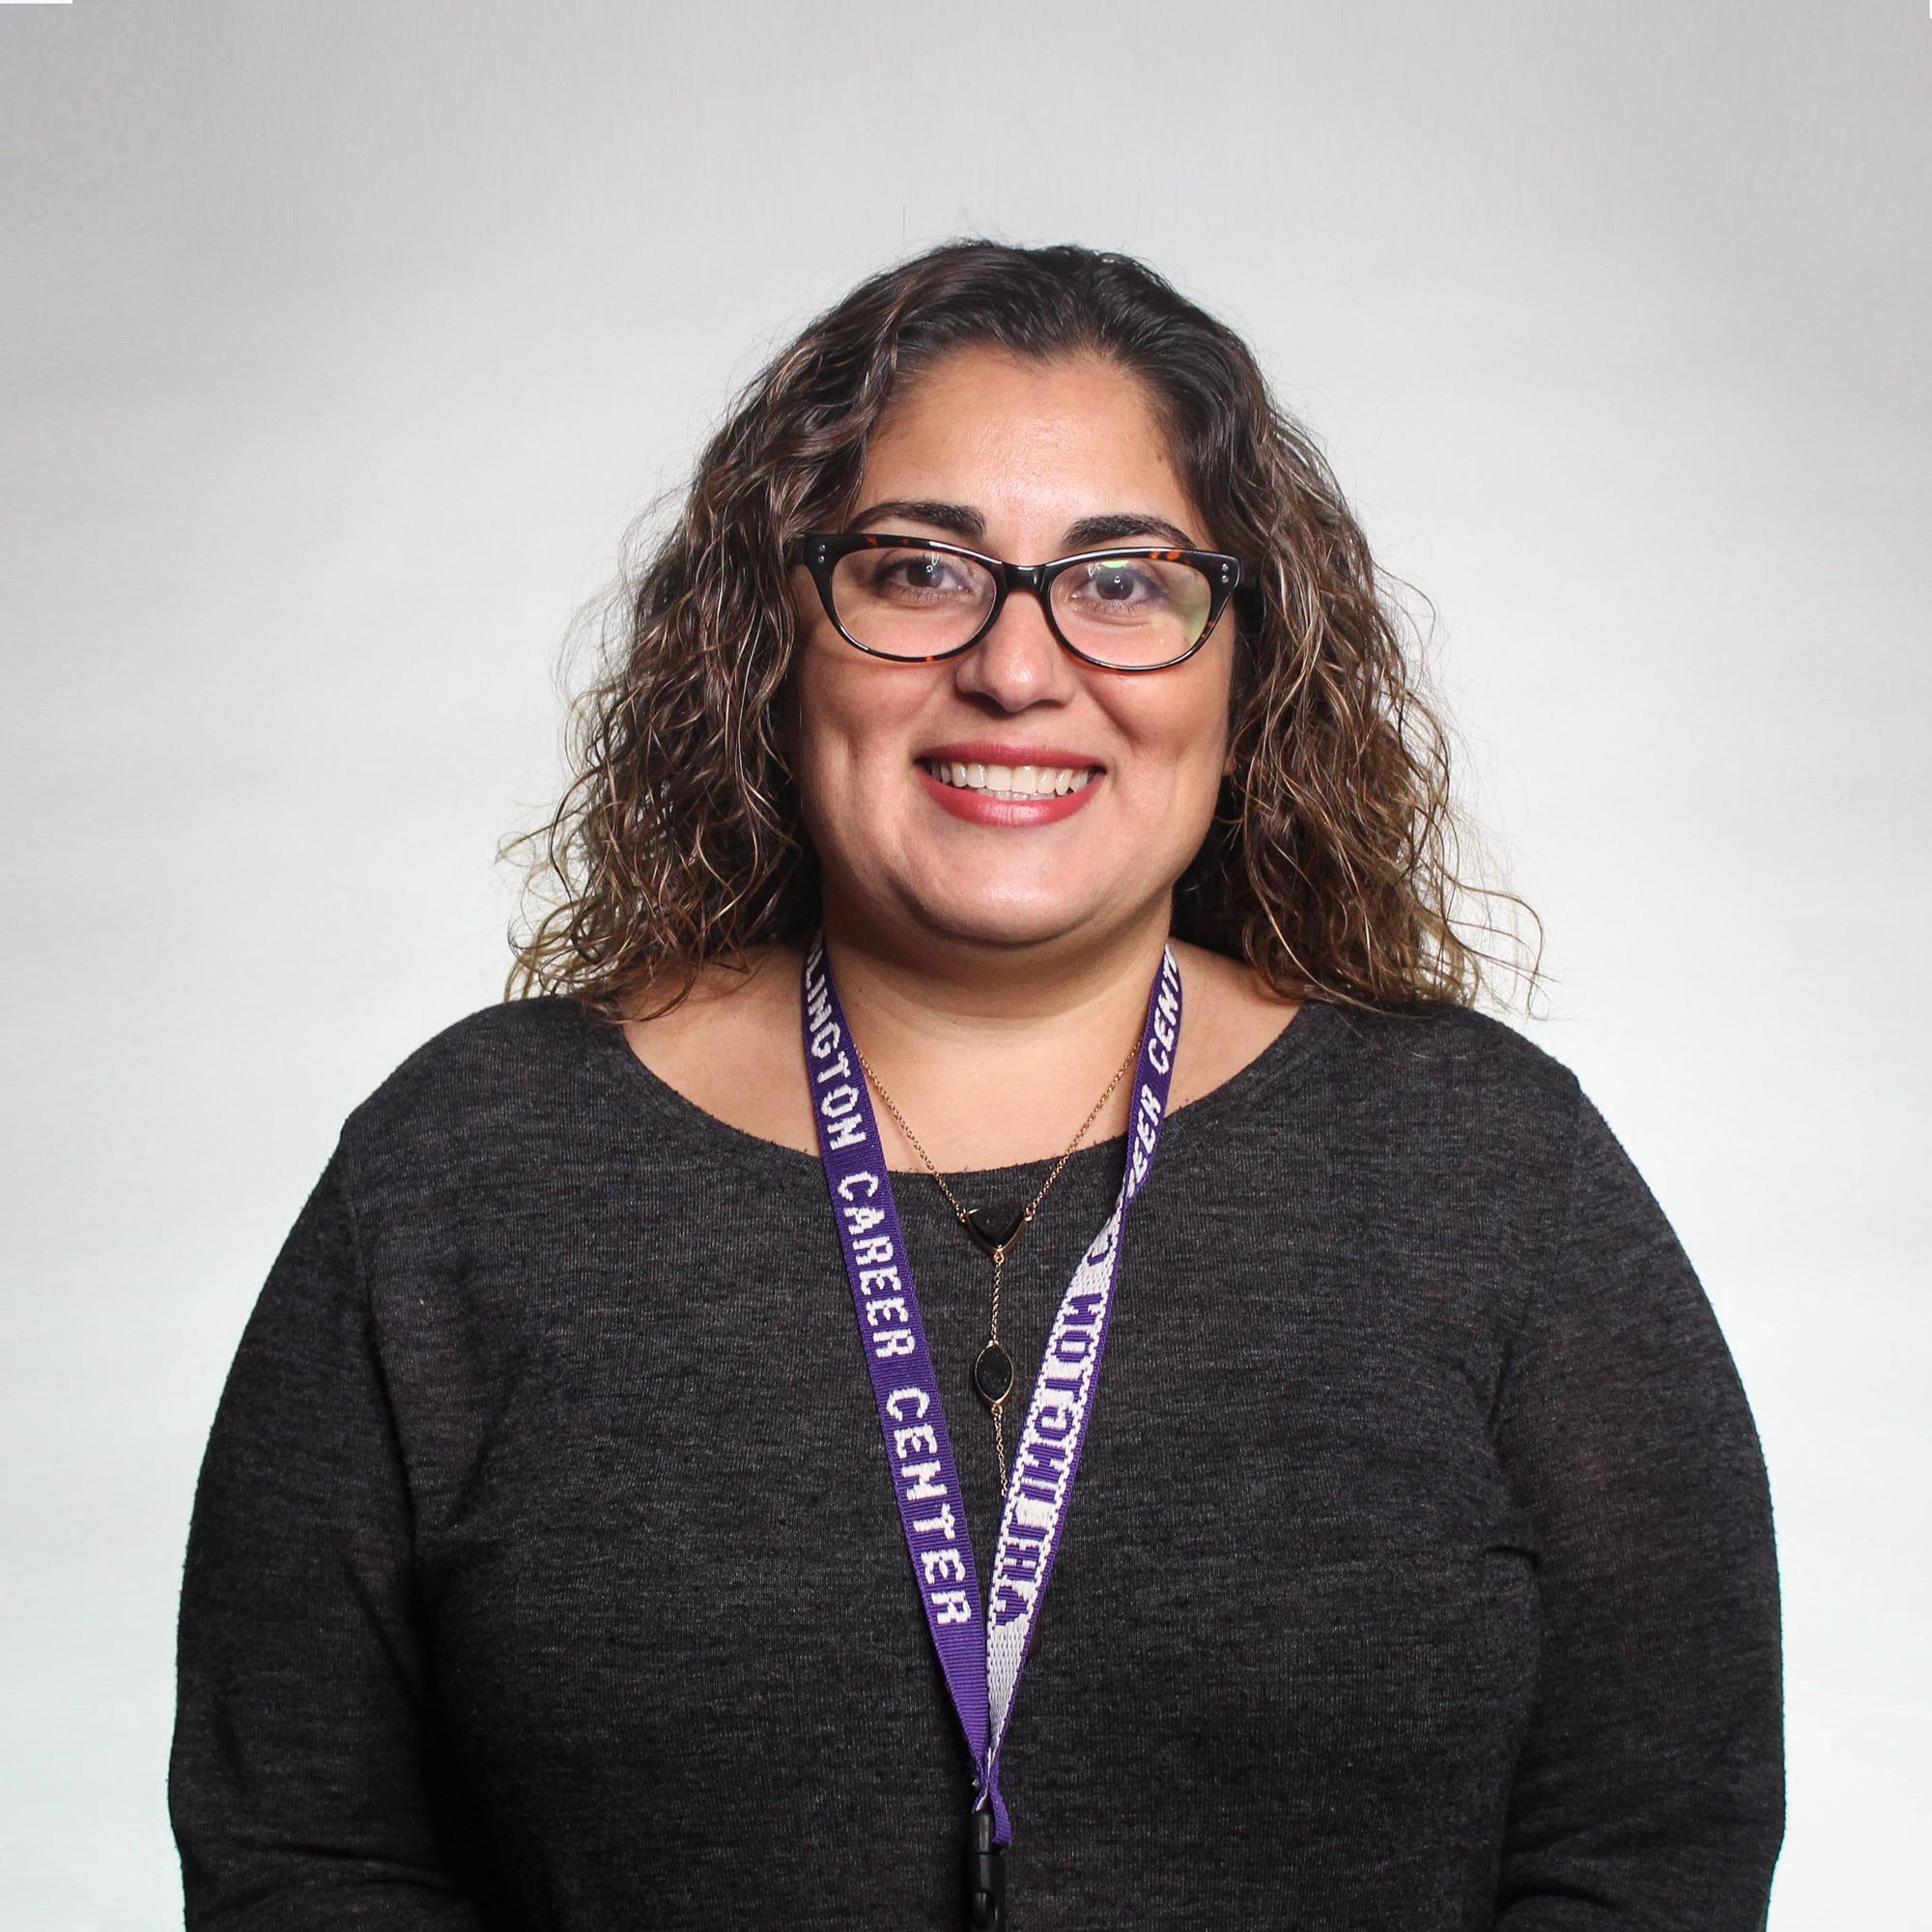 Ms. Naghmeh Merck